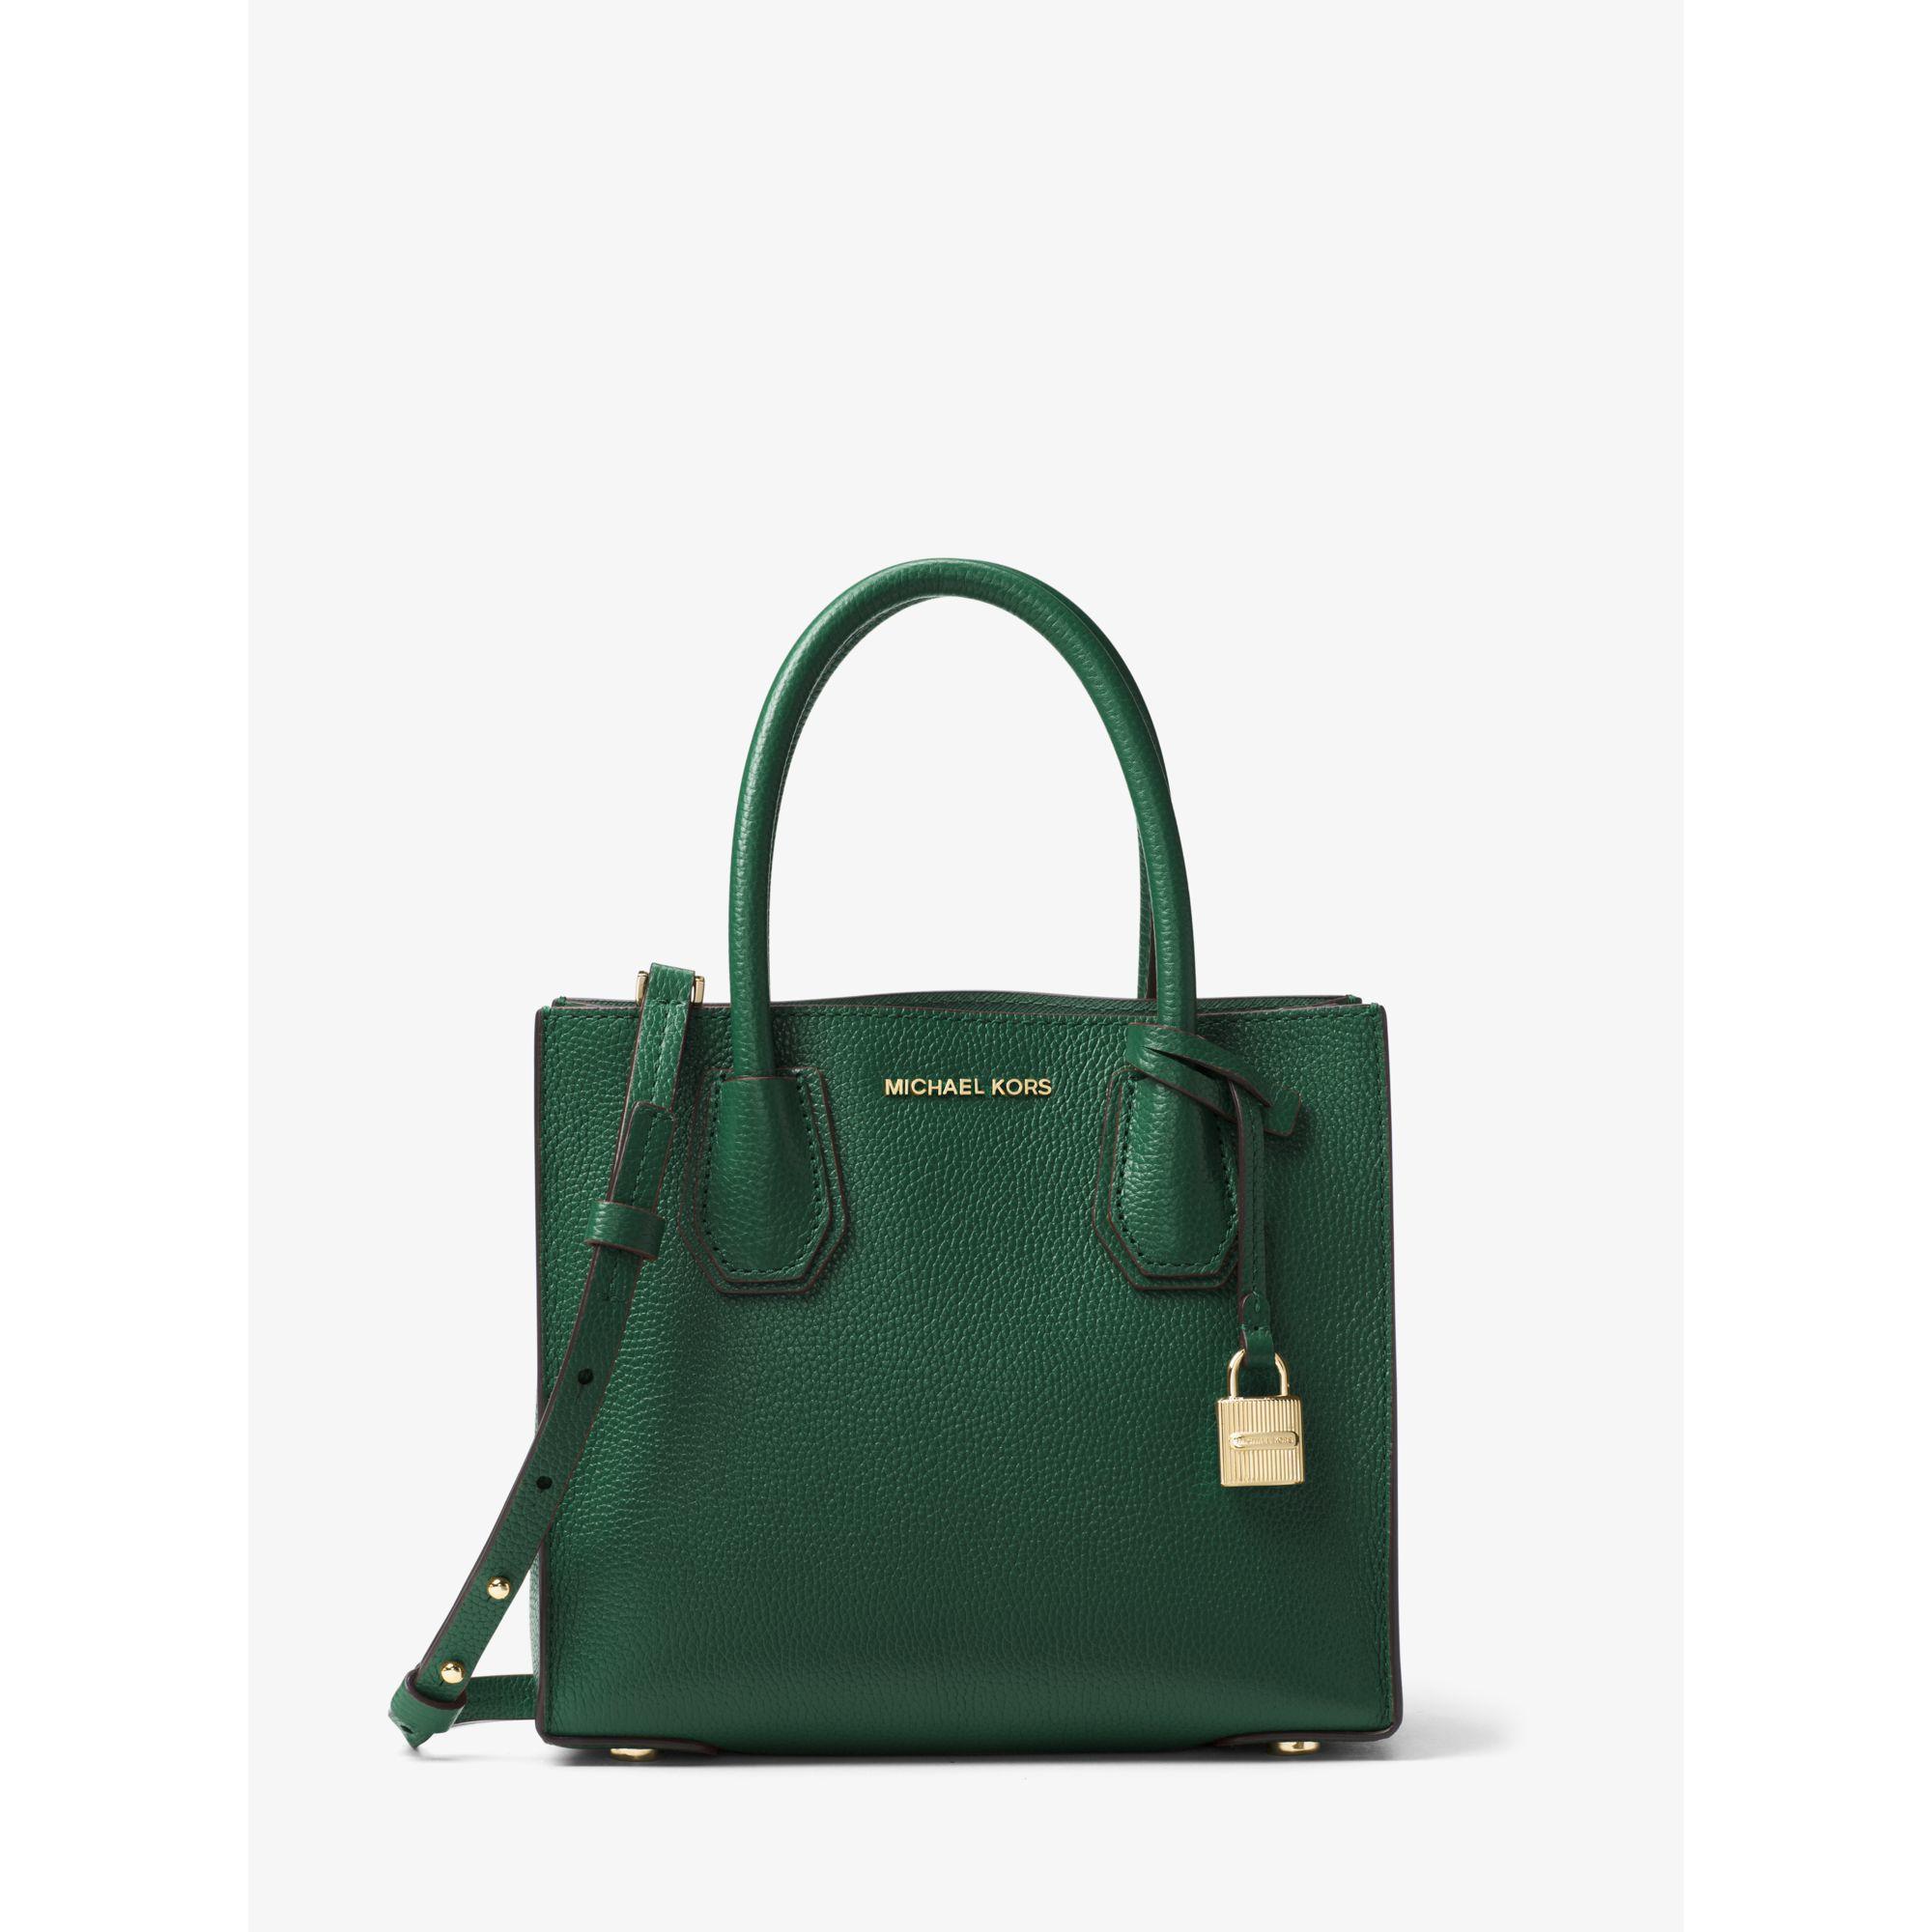 michael kors mercer medium leather bag in green lyst. Black Bedroom Furniture Sets. Home Design Ideas